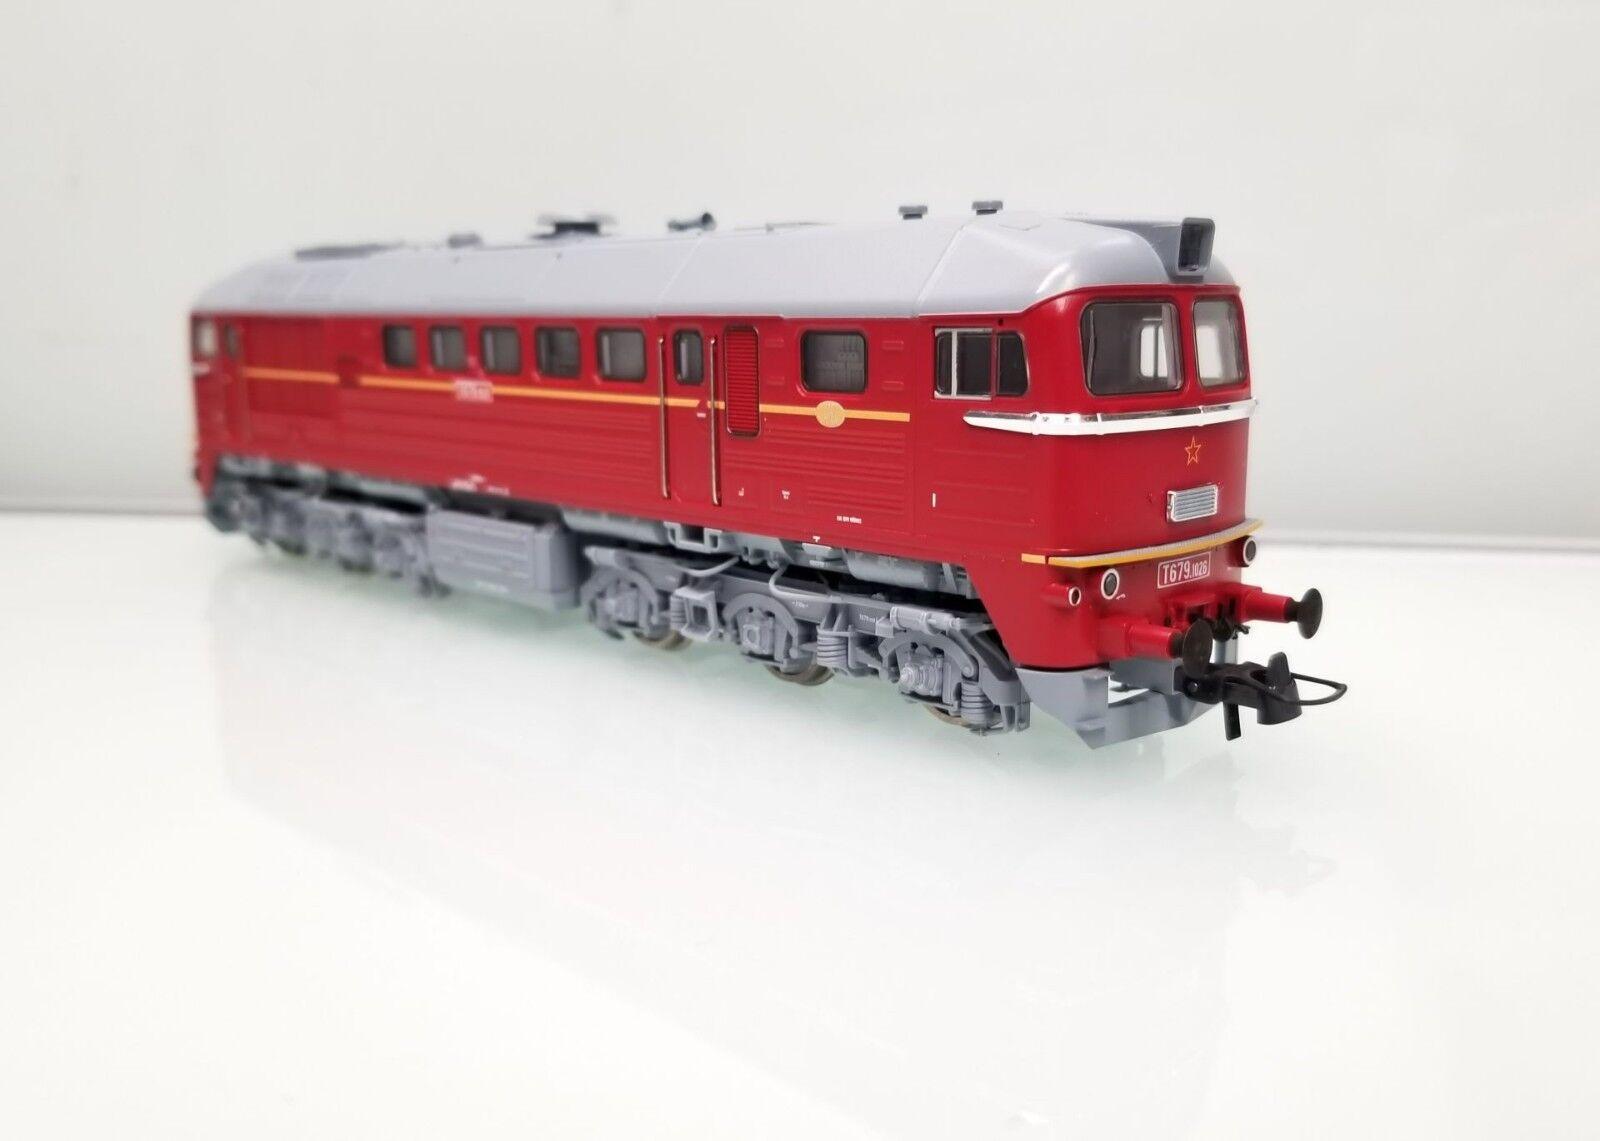 Roco 73804 diesellok taigatrommel t679 CSD época III-IV nuevo embalaje original